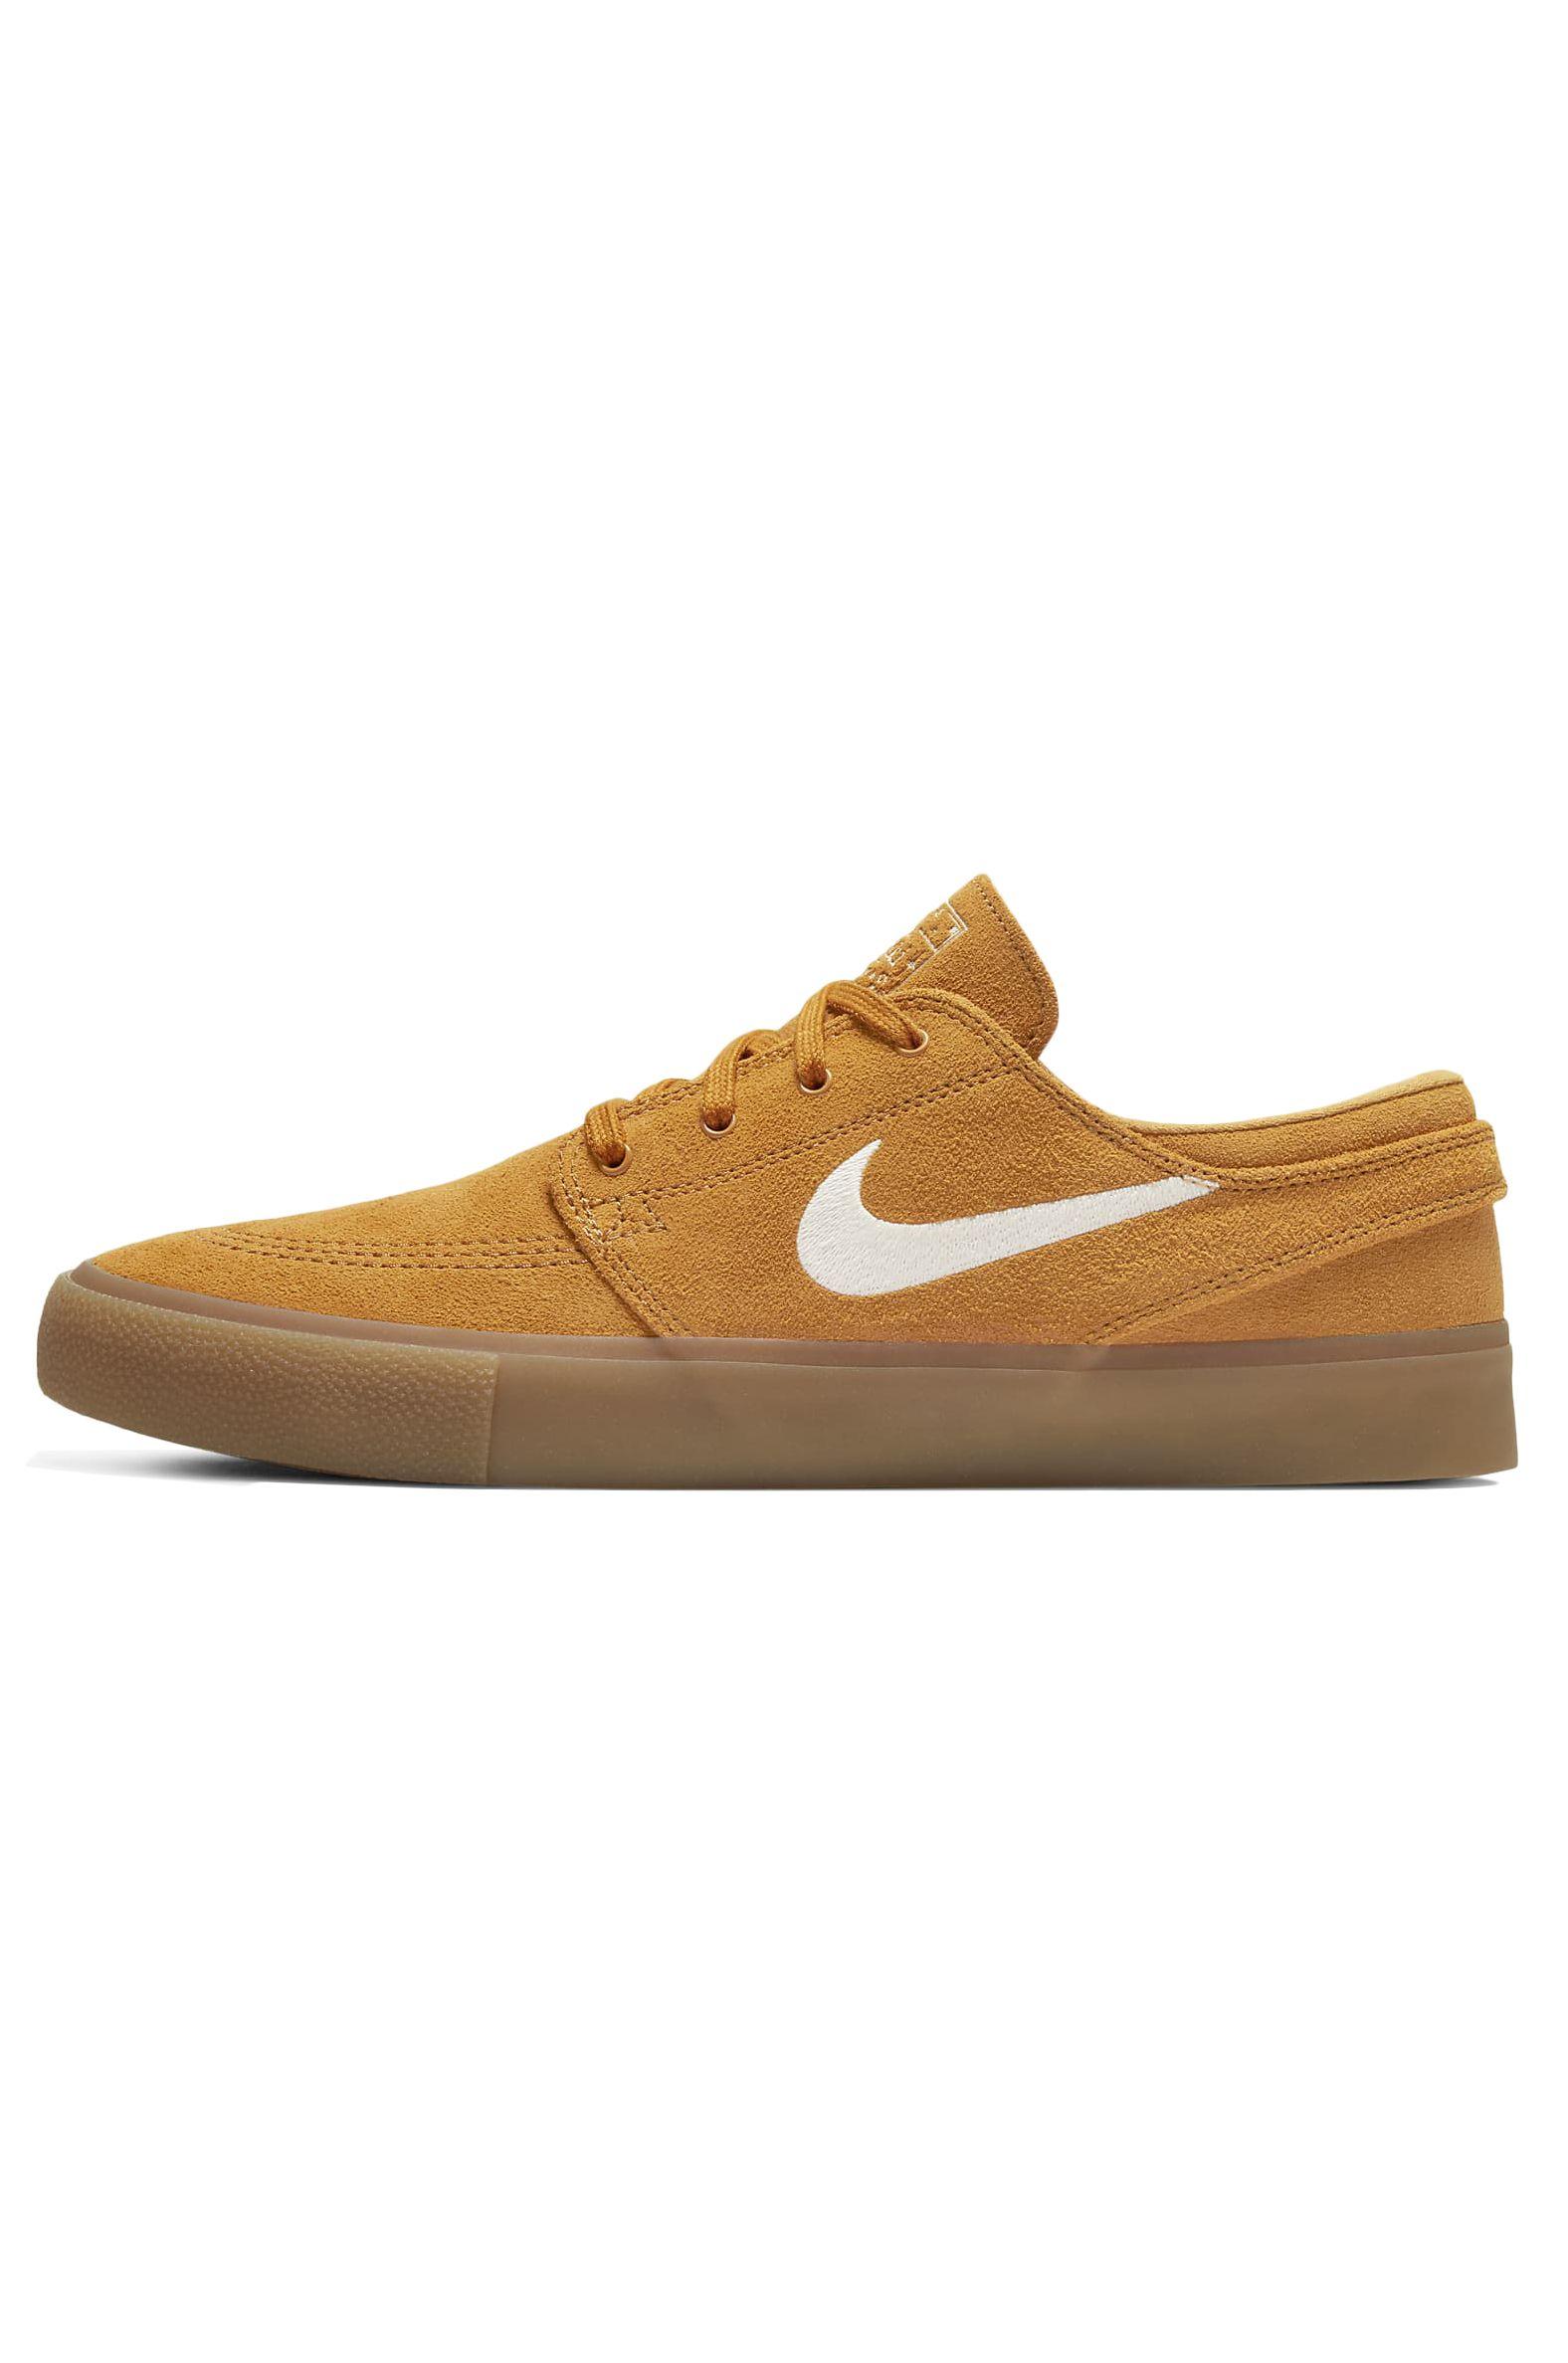 Tenis Nike Sb NIKE SB ZOOM JANOSKI RM Chutney/Sail-Chutney-Gum Lt Brown